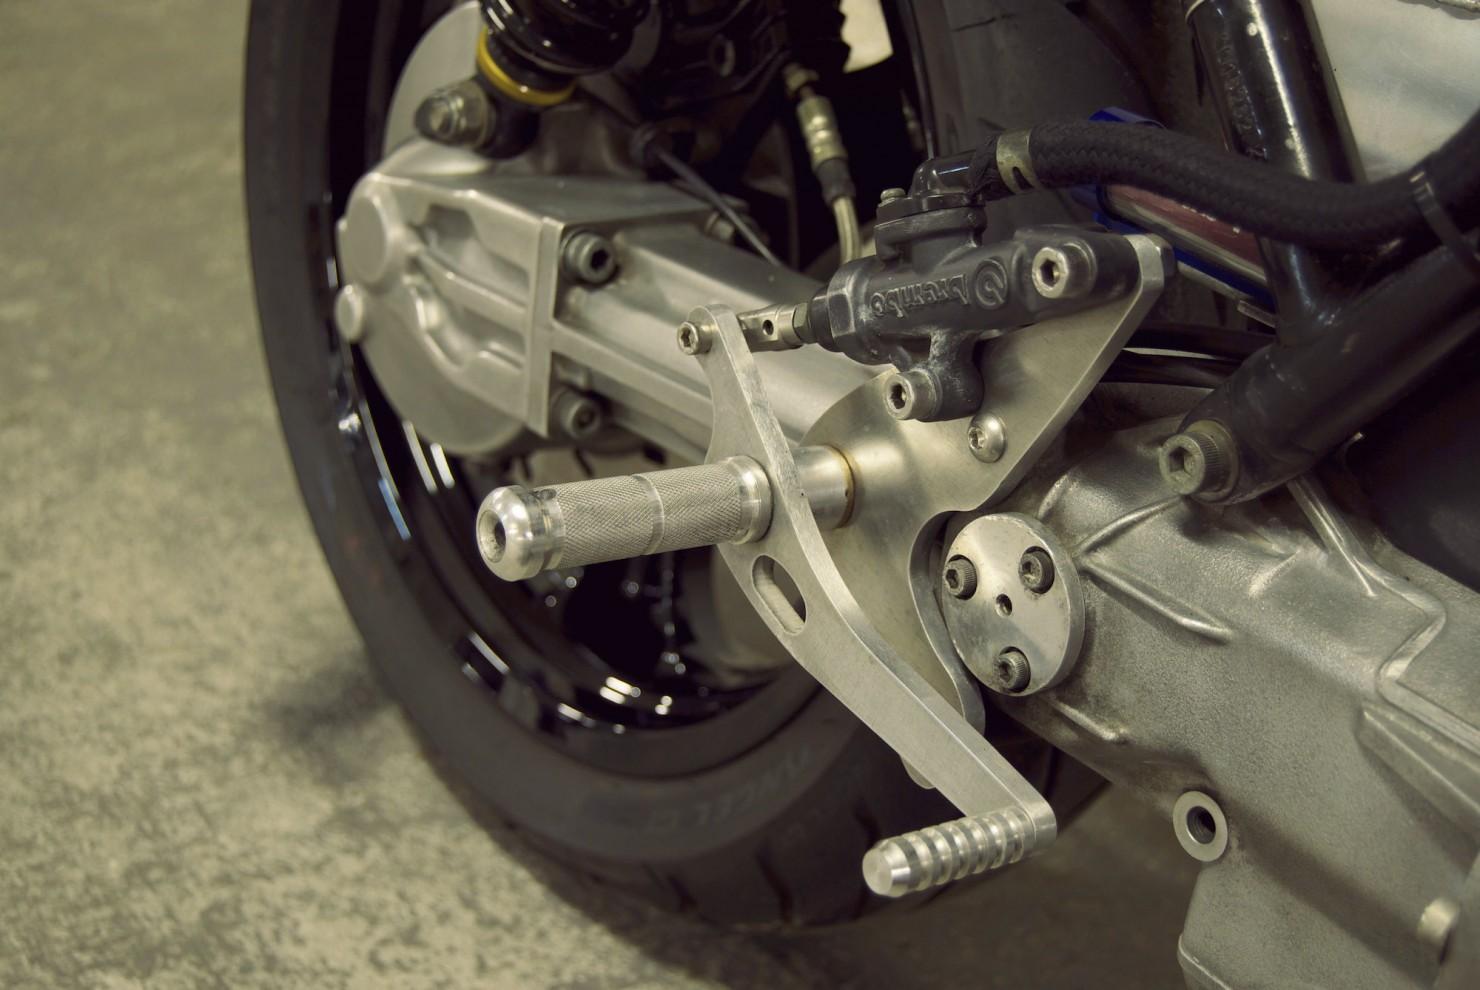 BMW K100 Motorcycle 4